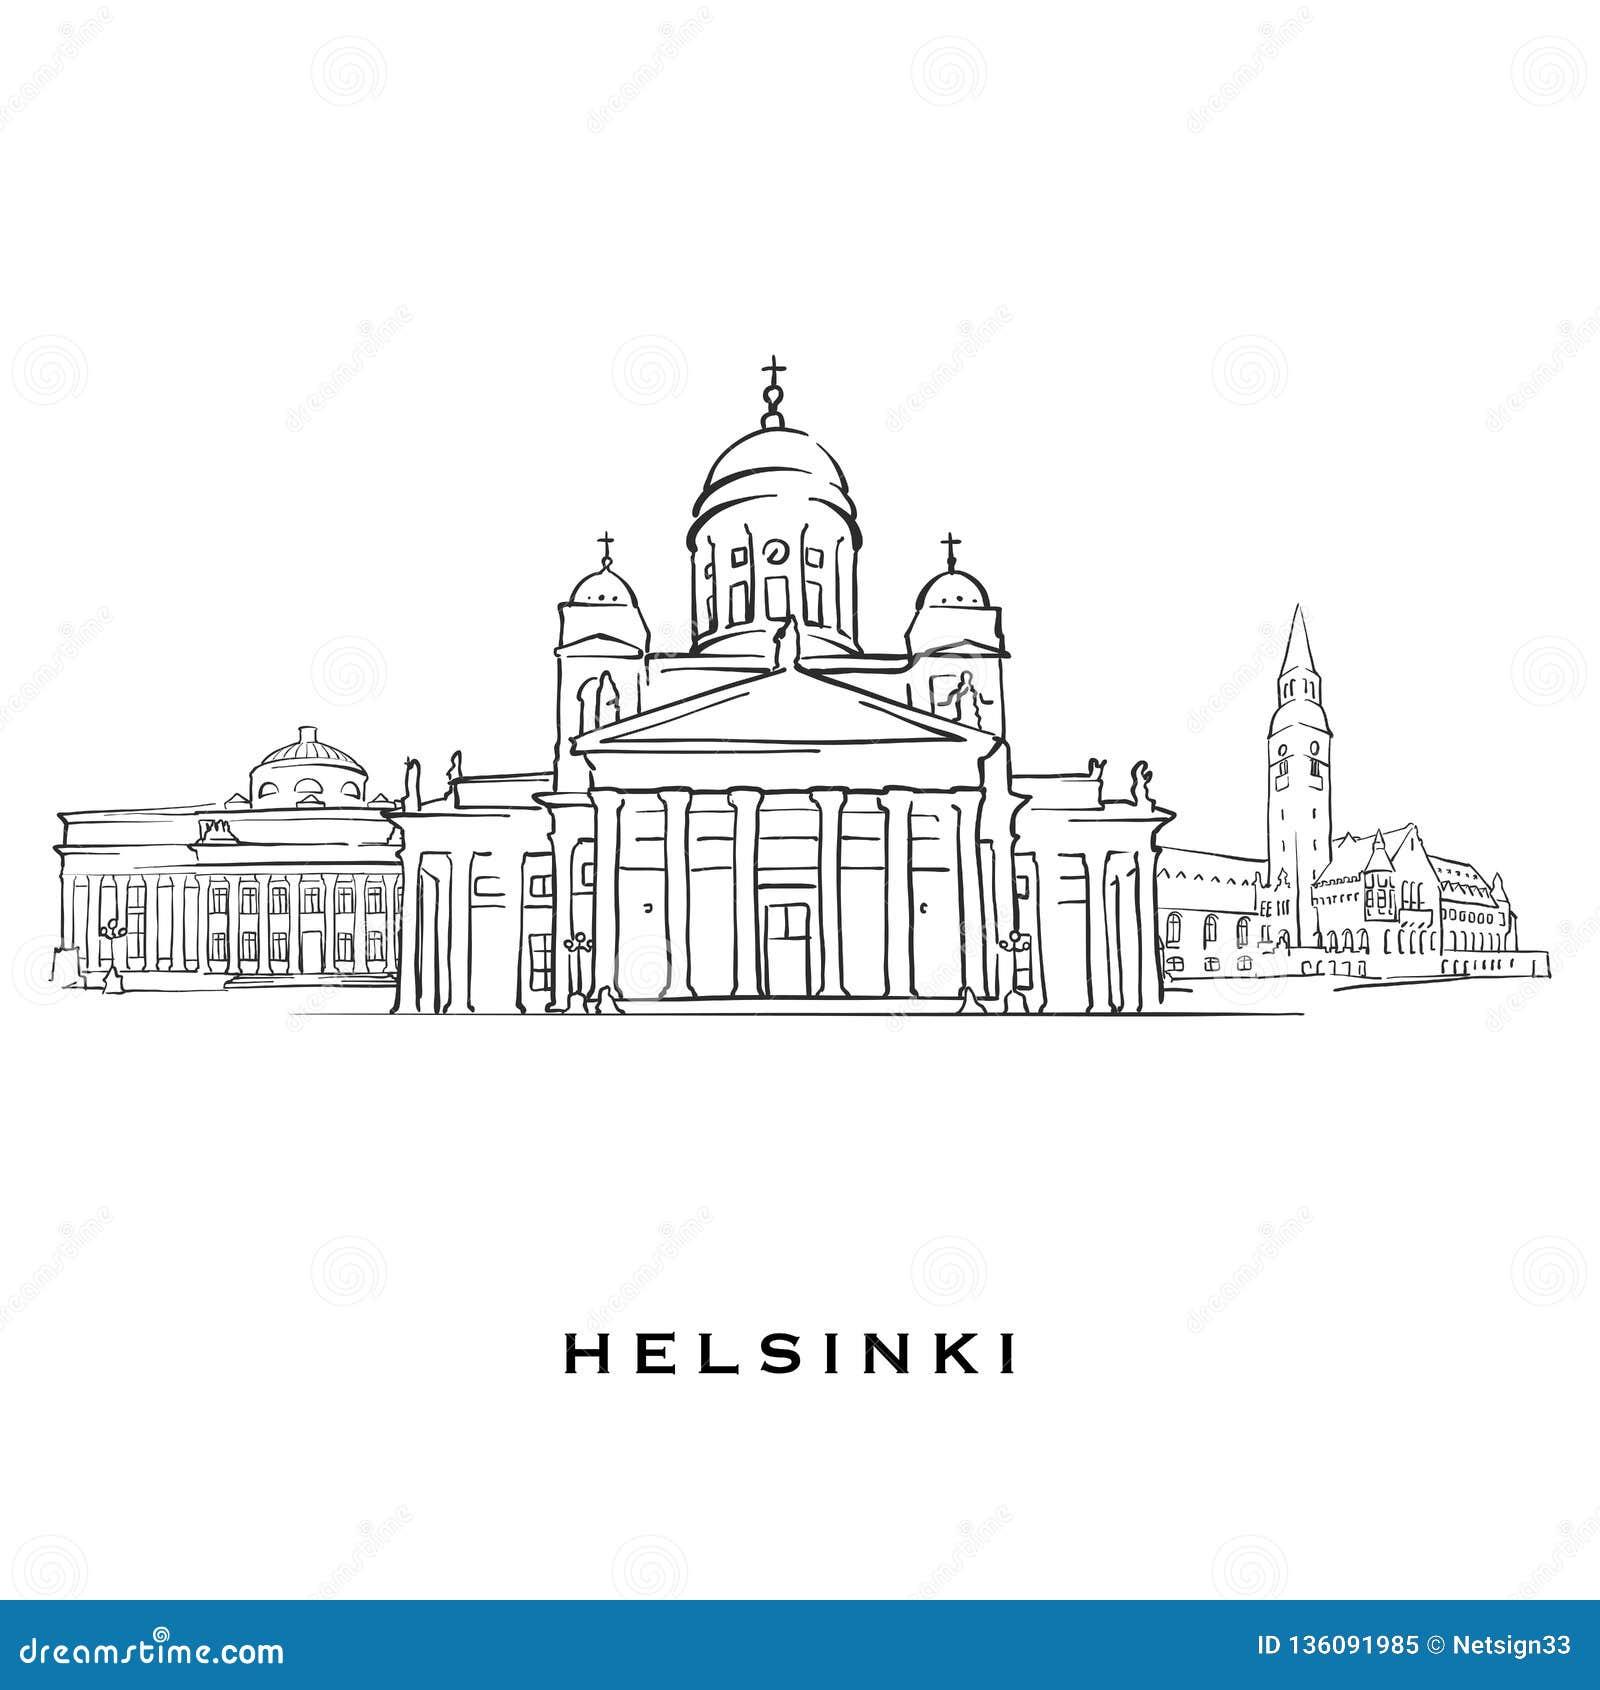 Helsinki Finland Famous Architecture Stock Vector - Illustration of